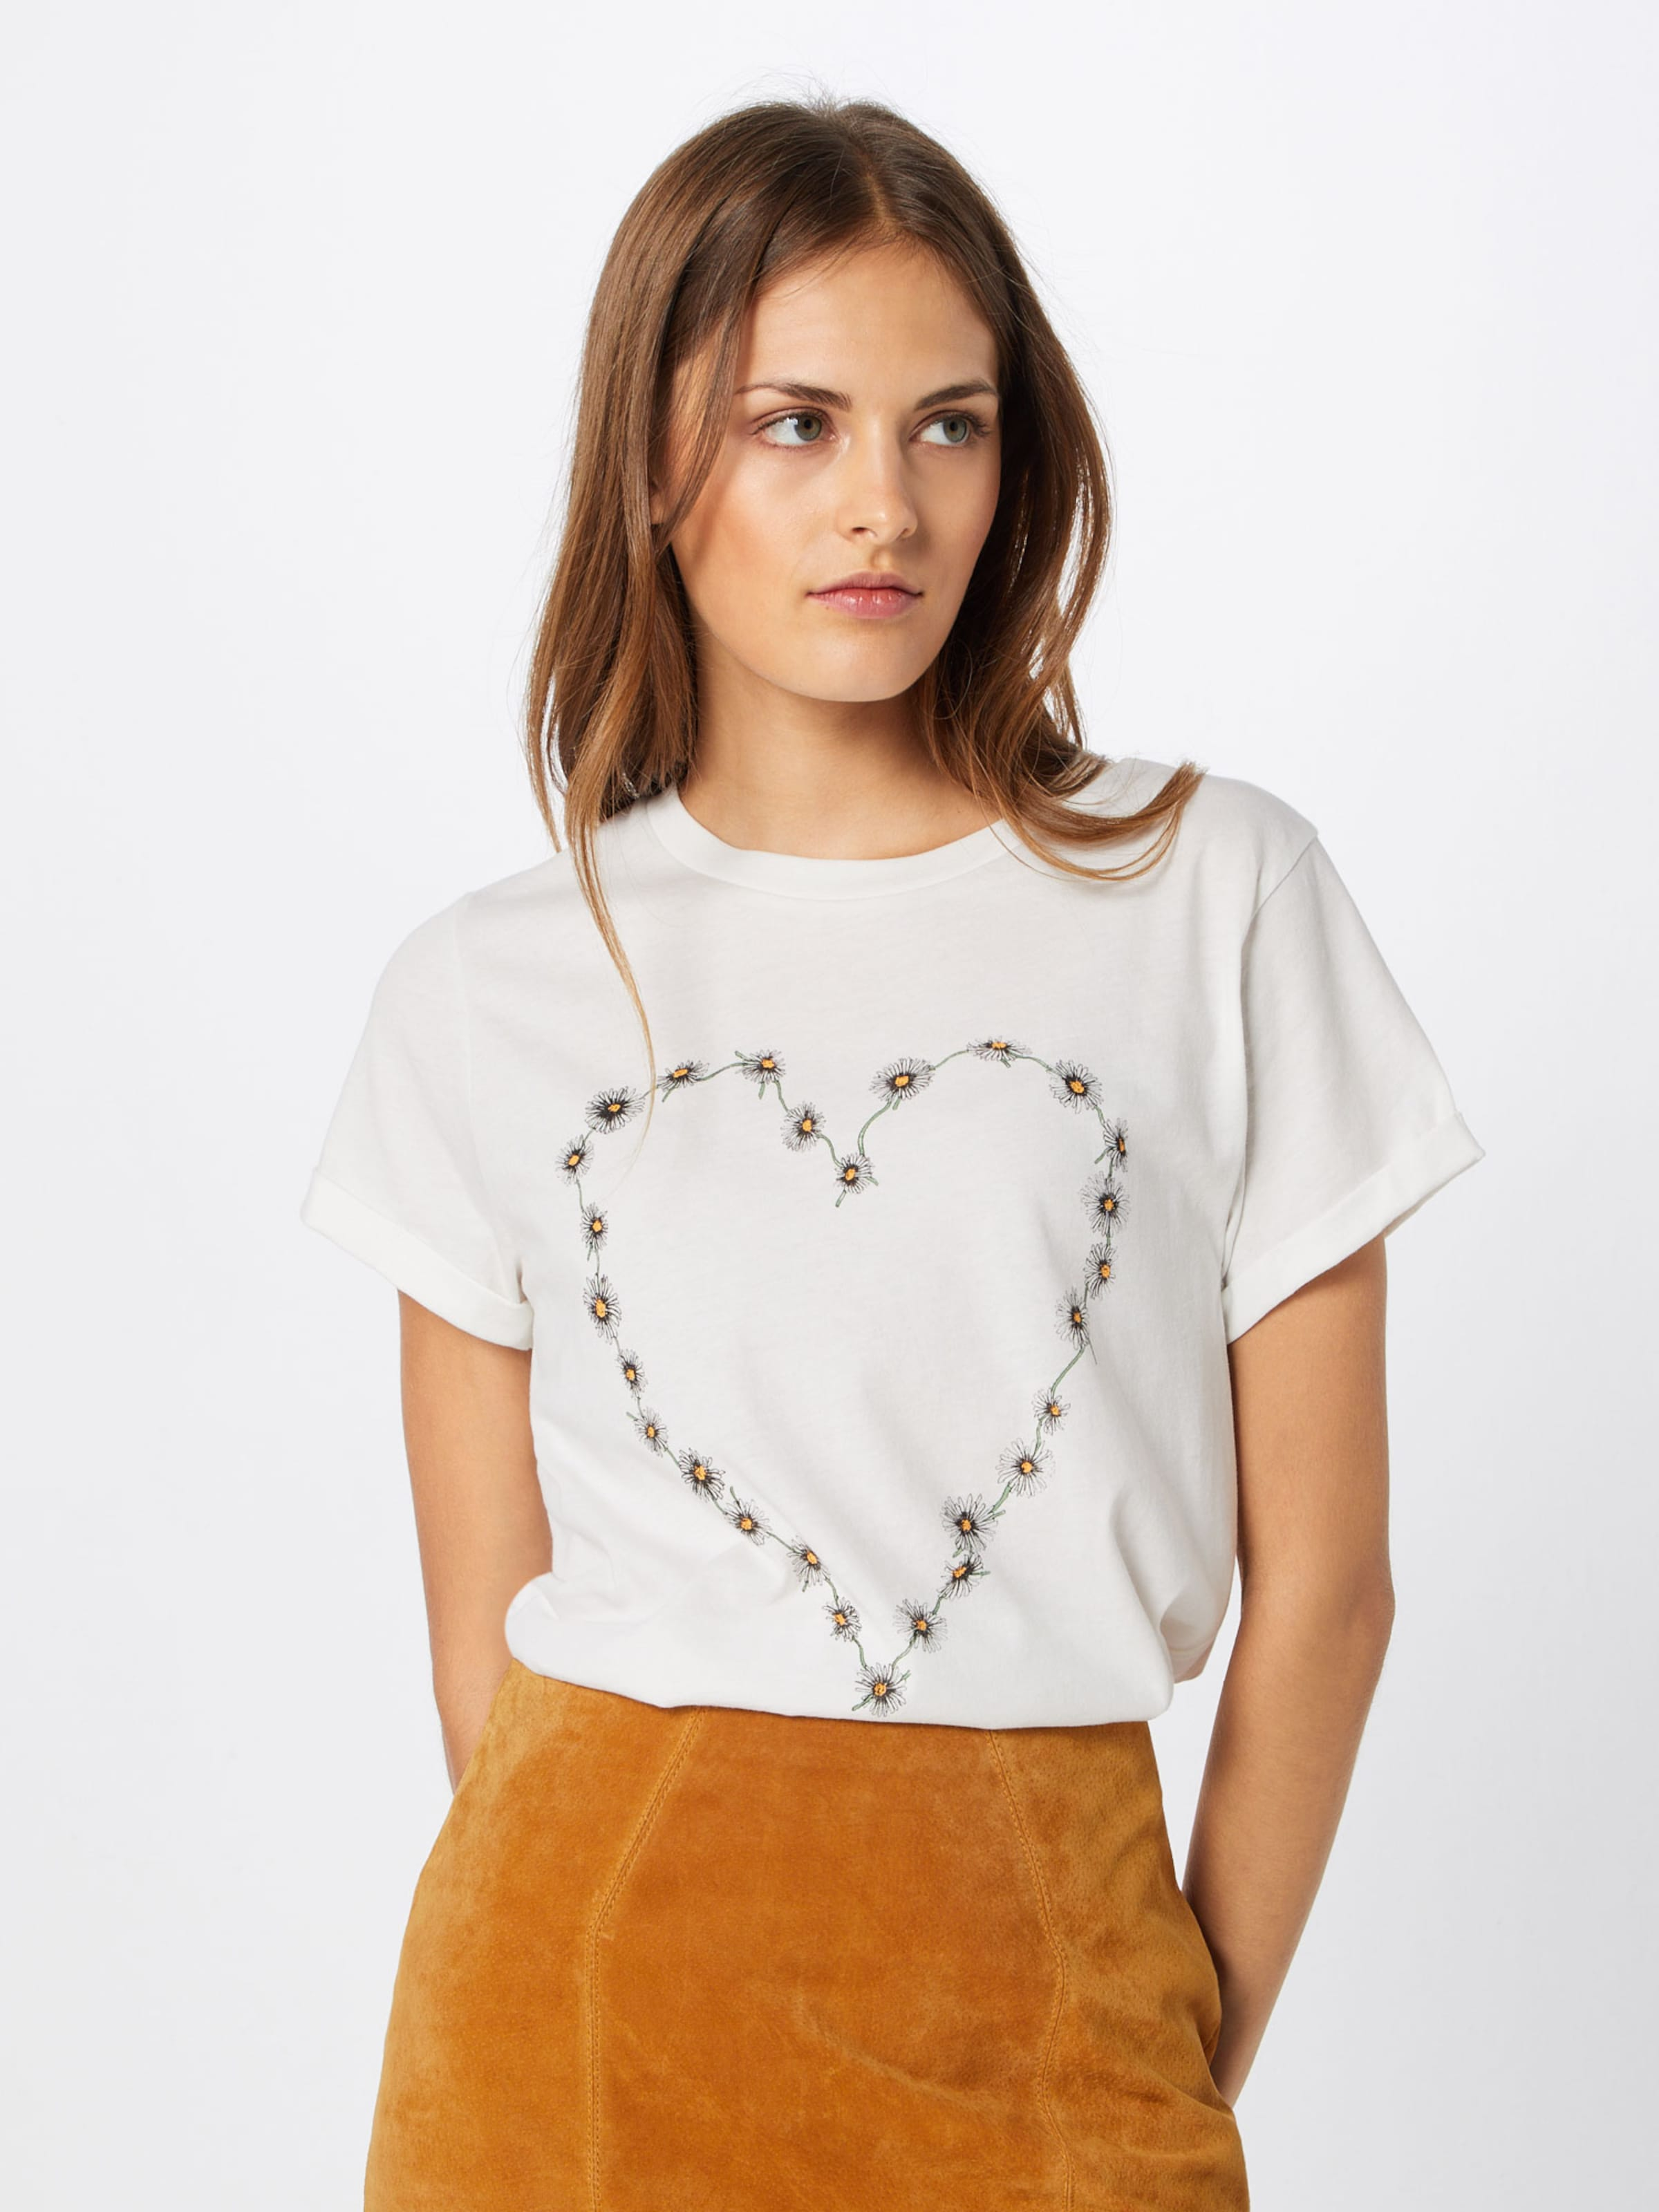 Catwalk shirt Anthracite Junkie T 's Spring' En Rc35Aj4Lq